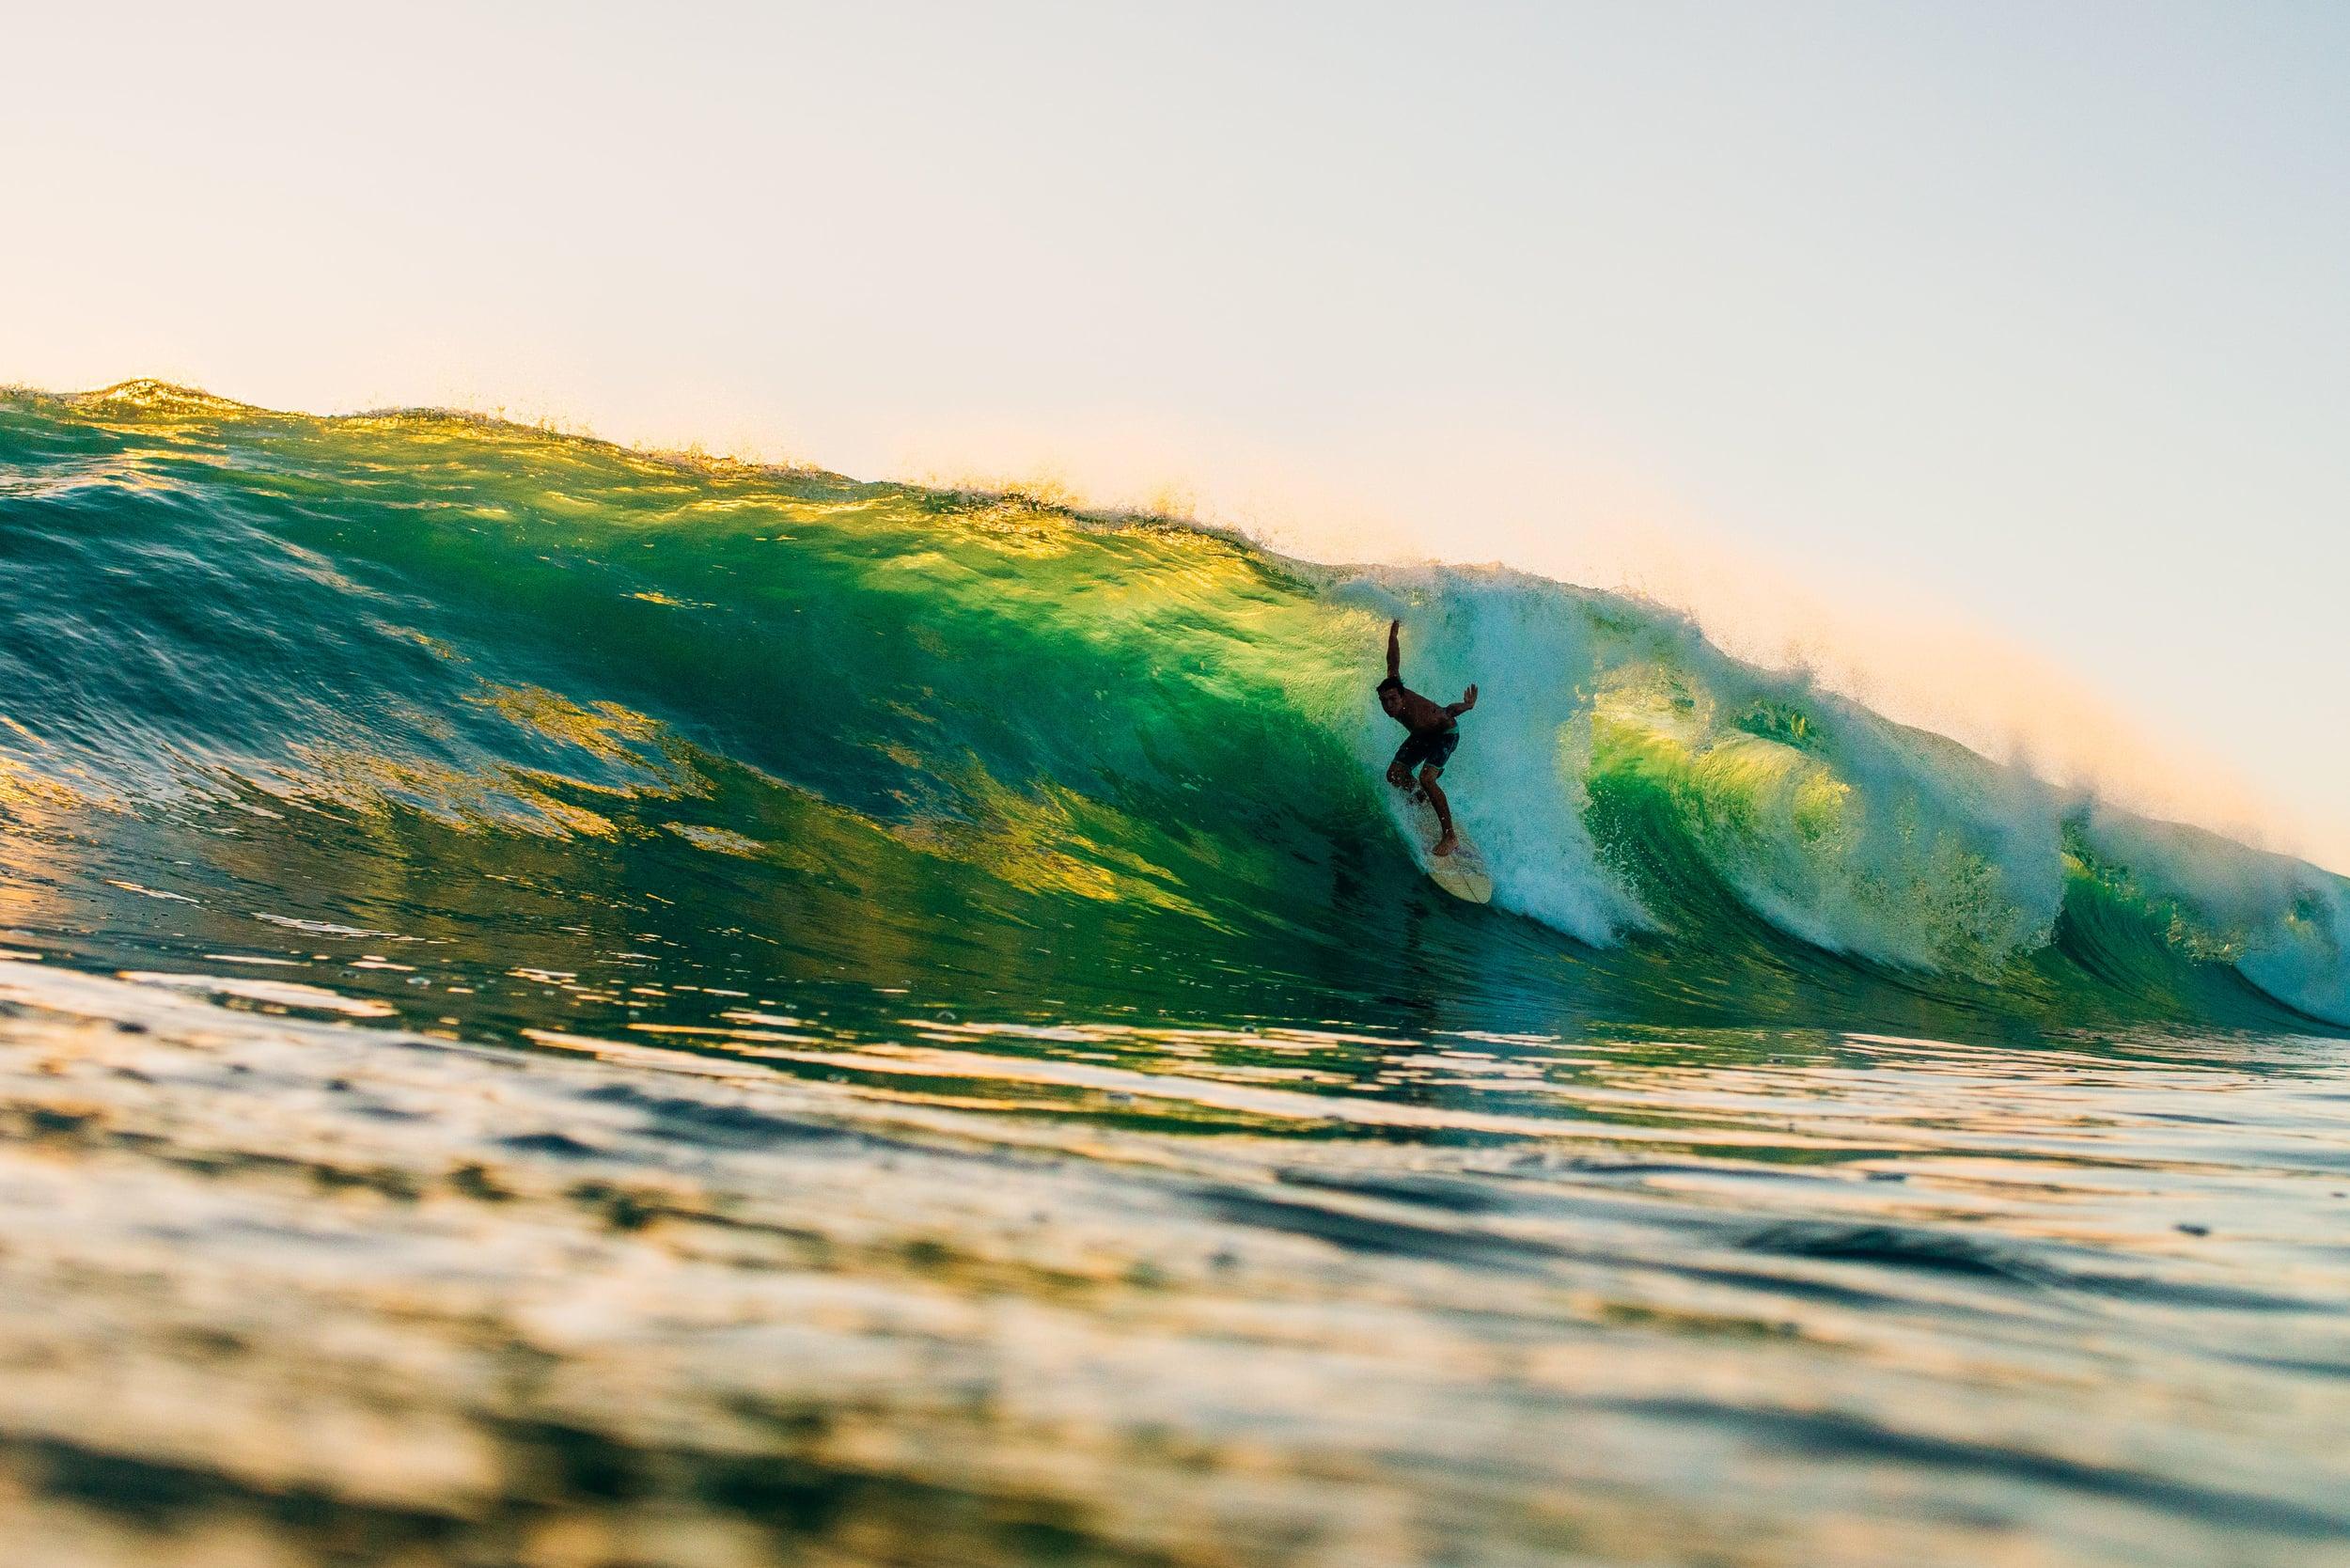 bryce-johnson-photography-kauai-hawaii-surfing-a7rii-aquatech-water-ocean-7.jpg